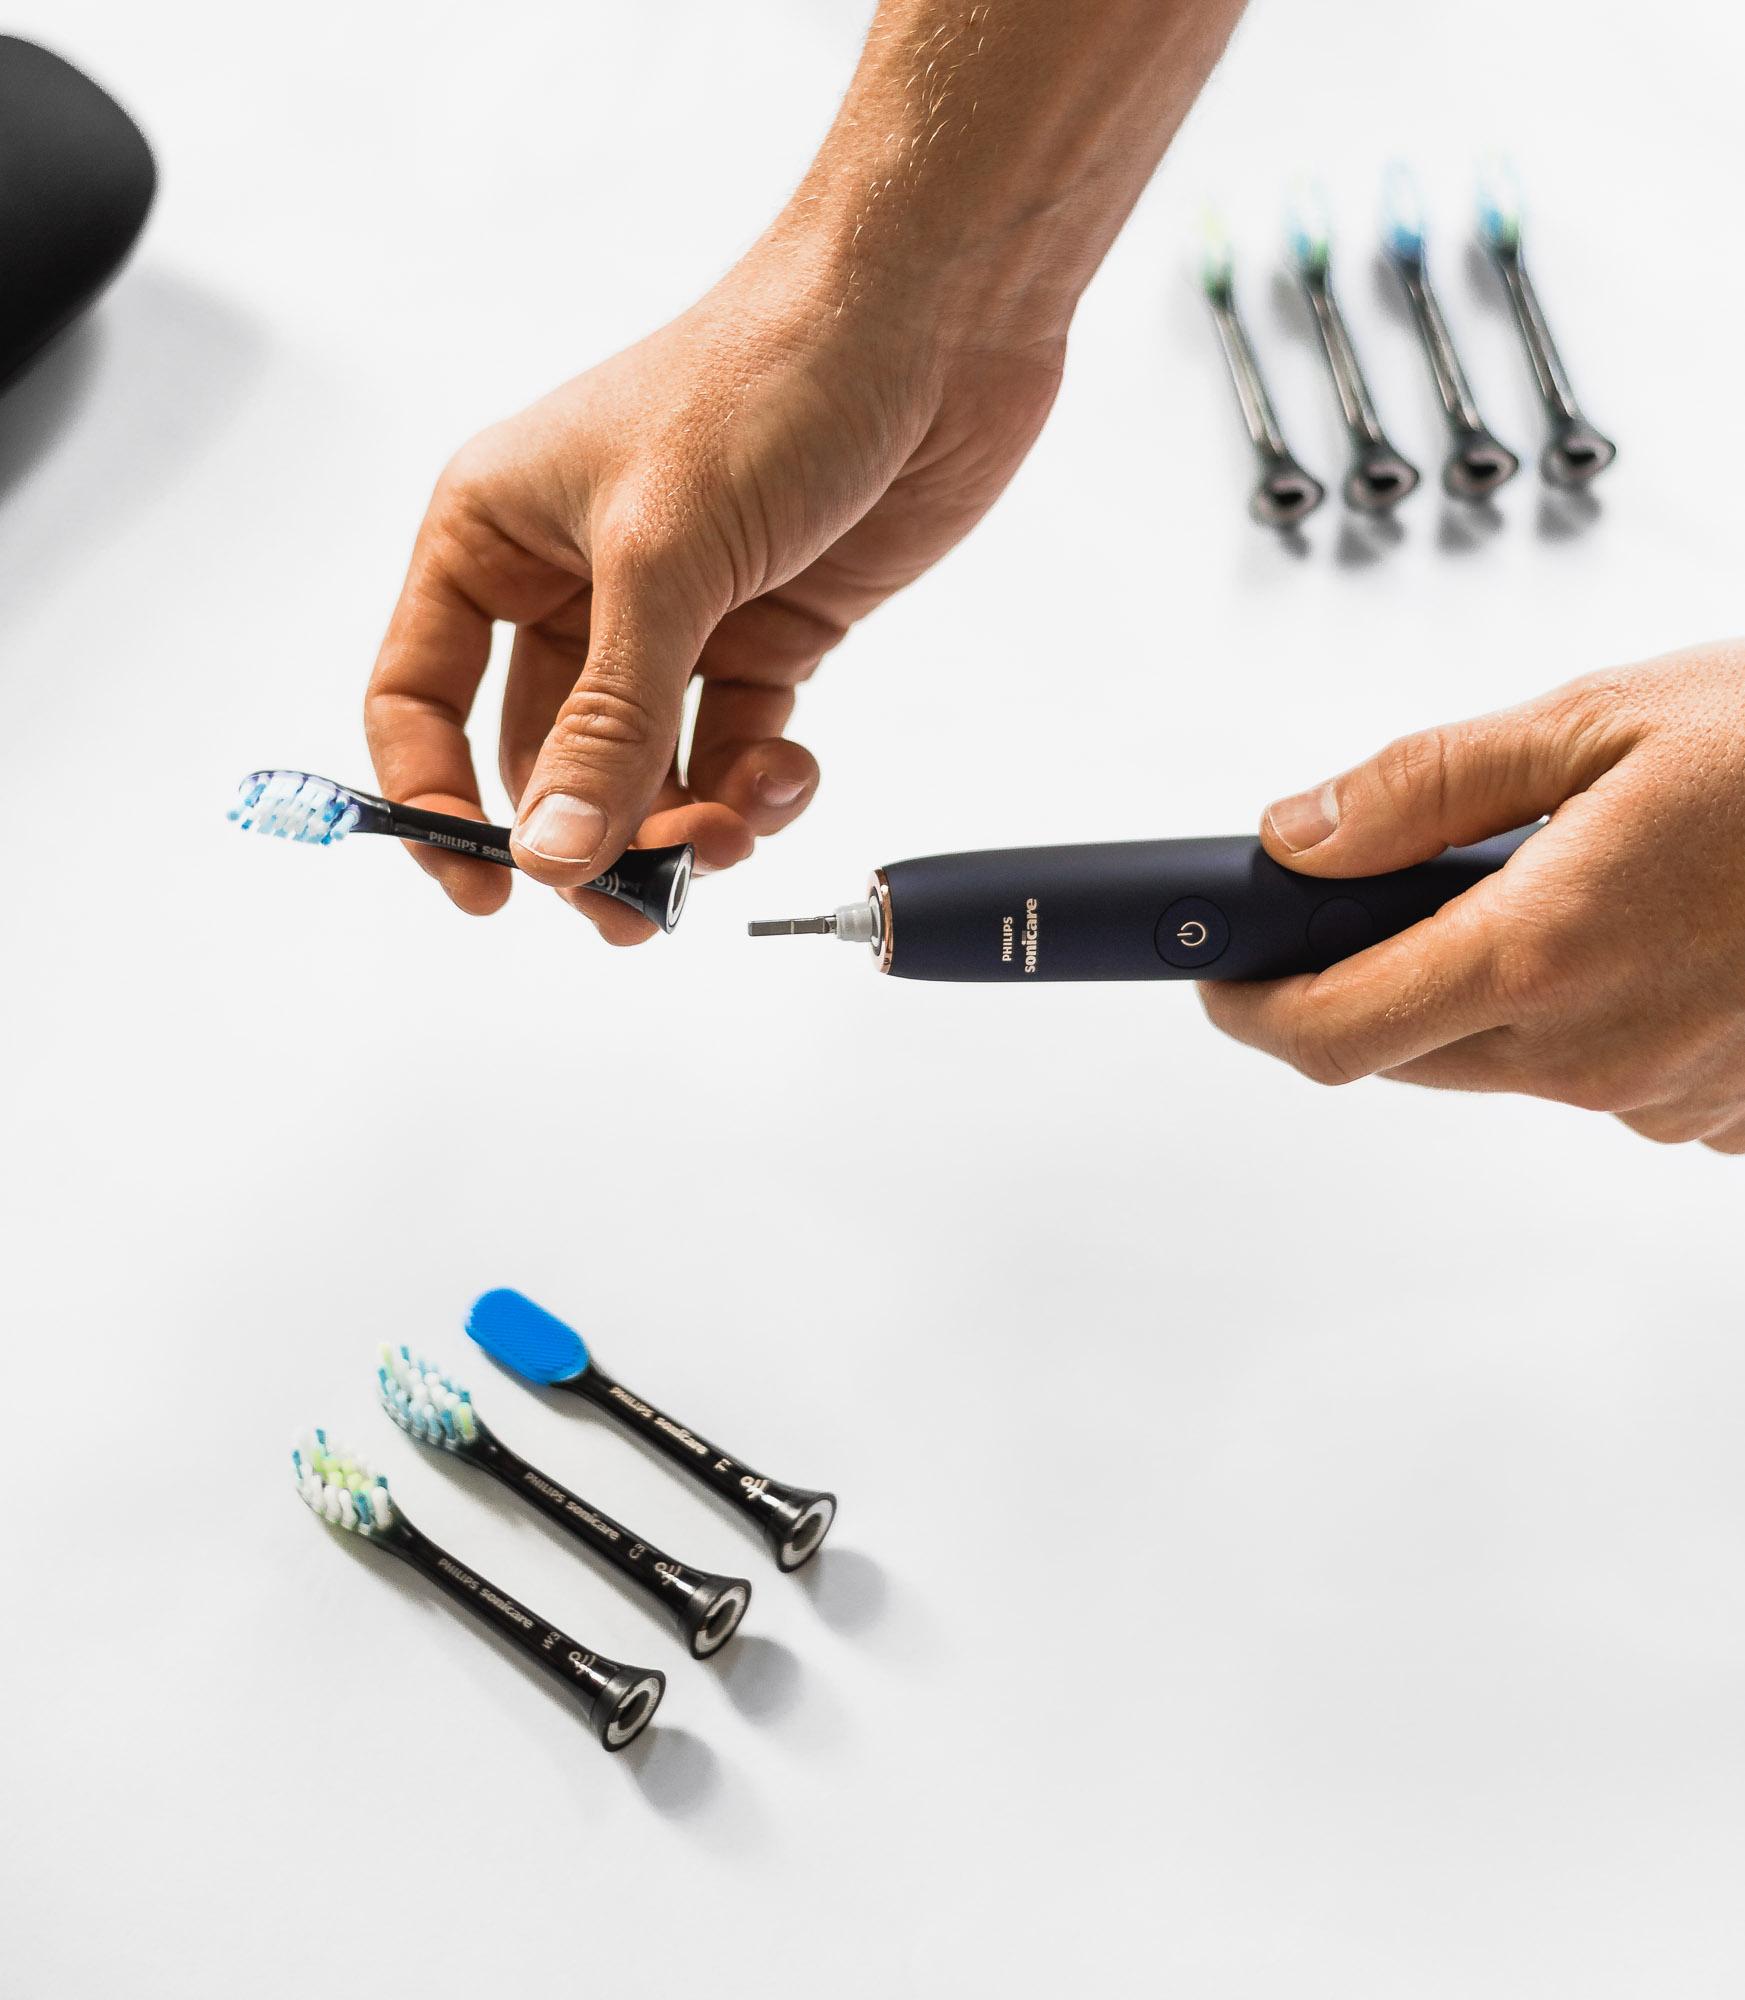 Philips Sonicare DiamondClean Smart toothbrush 9700